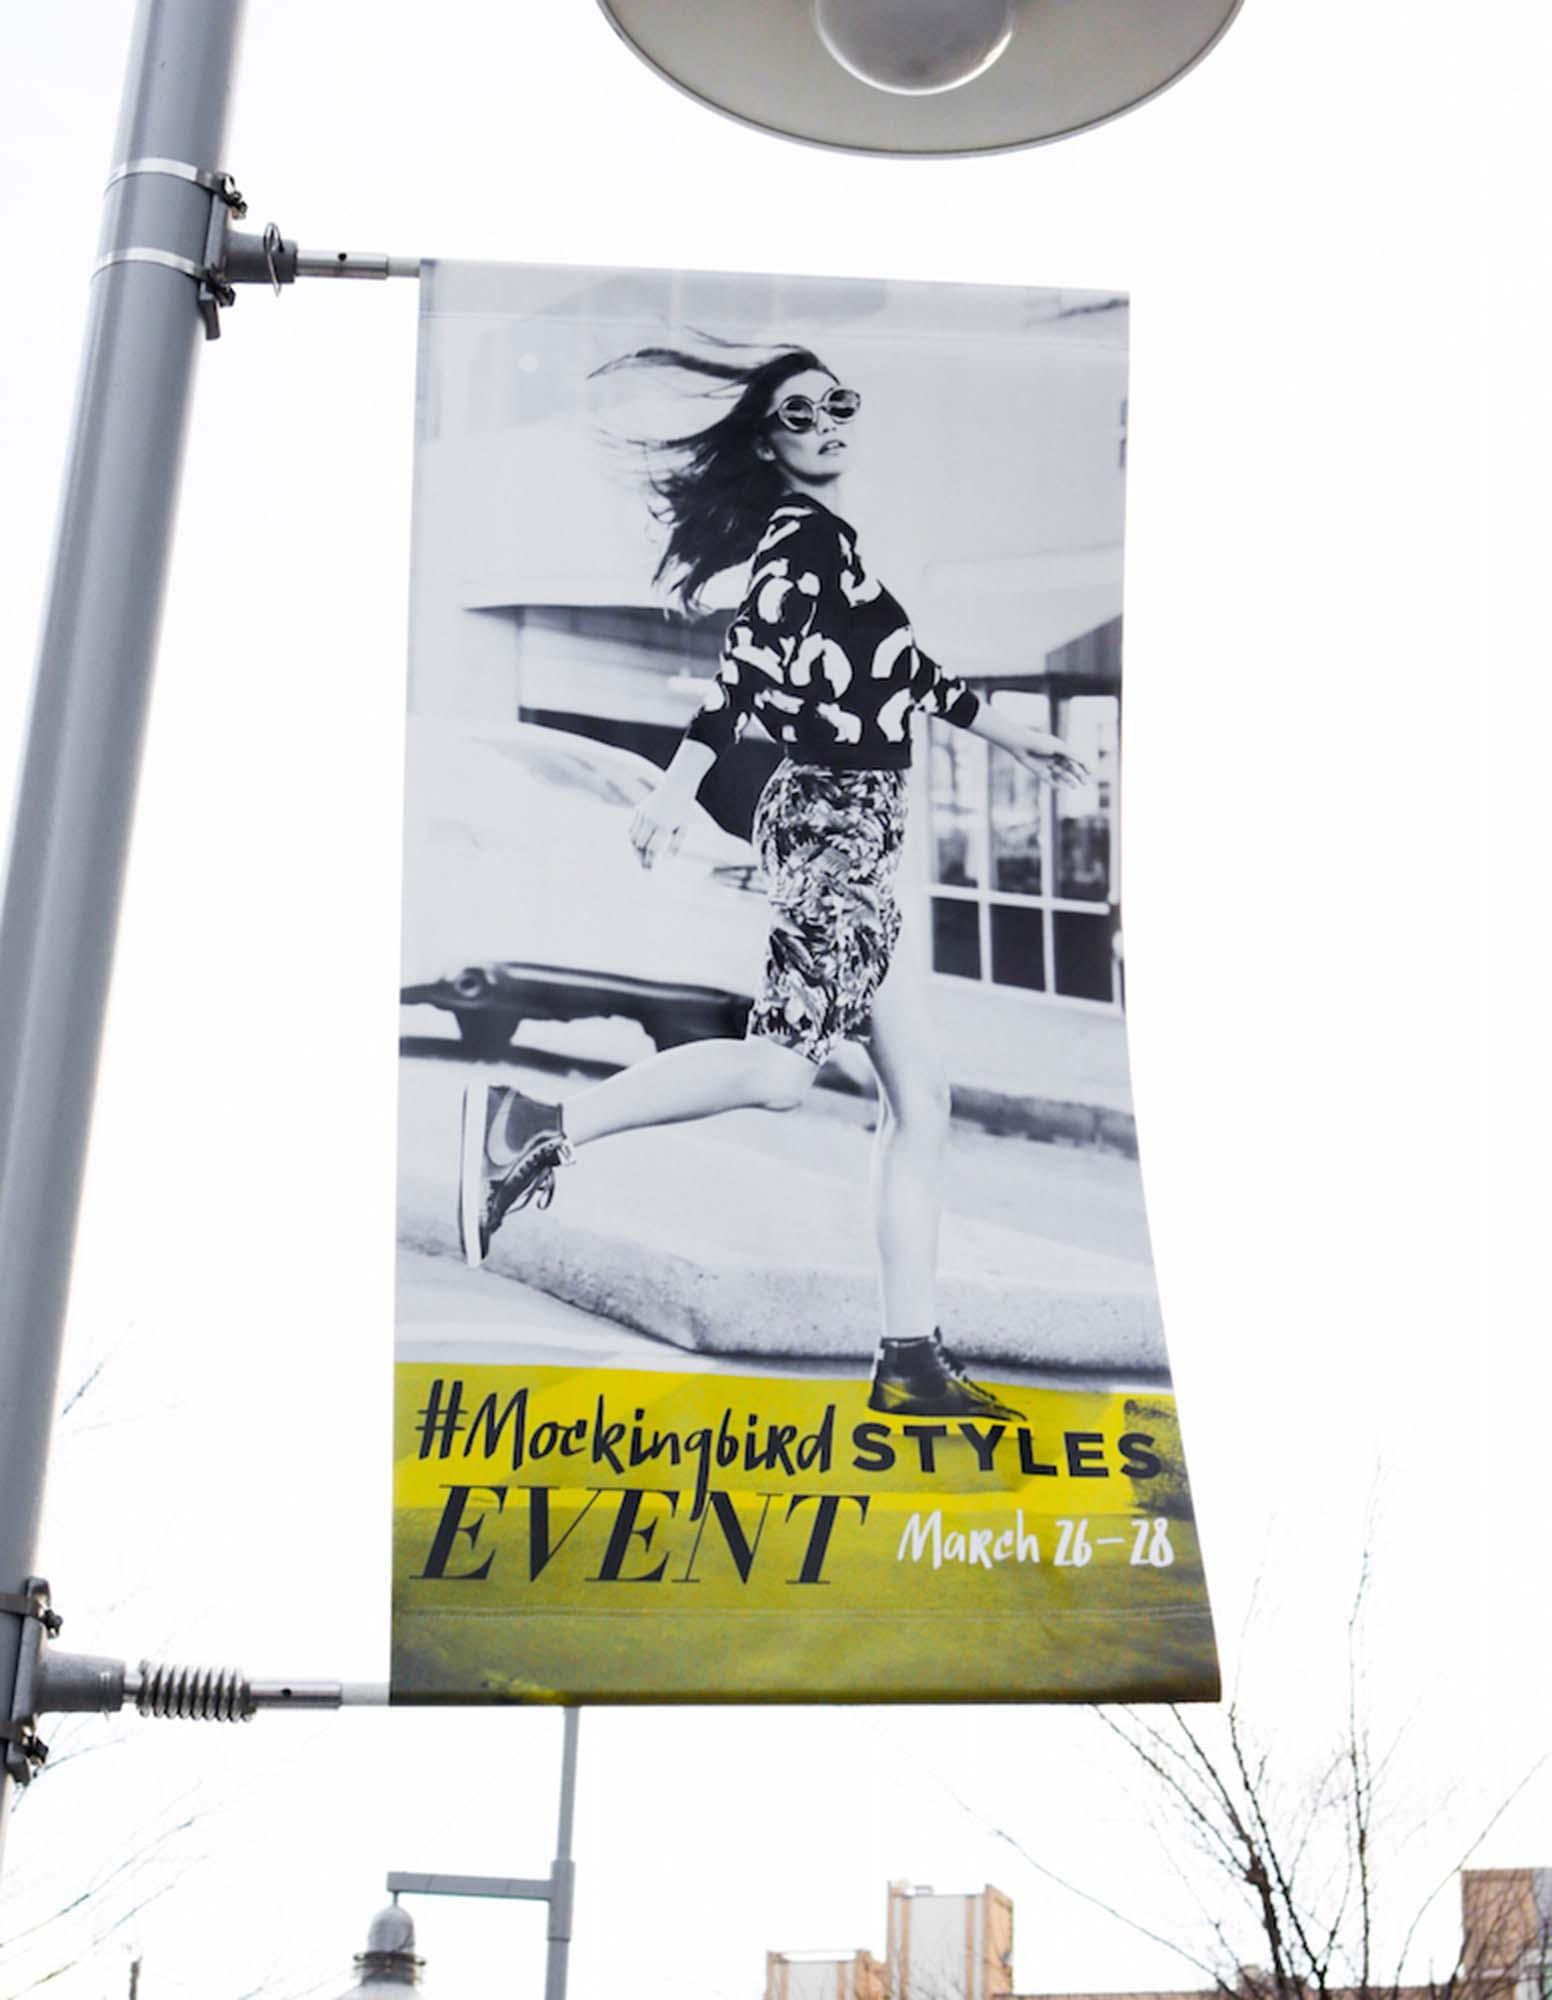 Mockingbird Styles Event